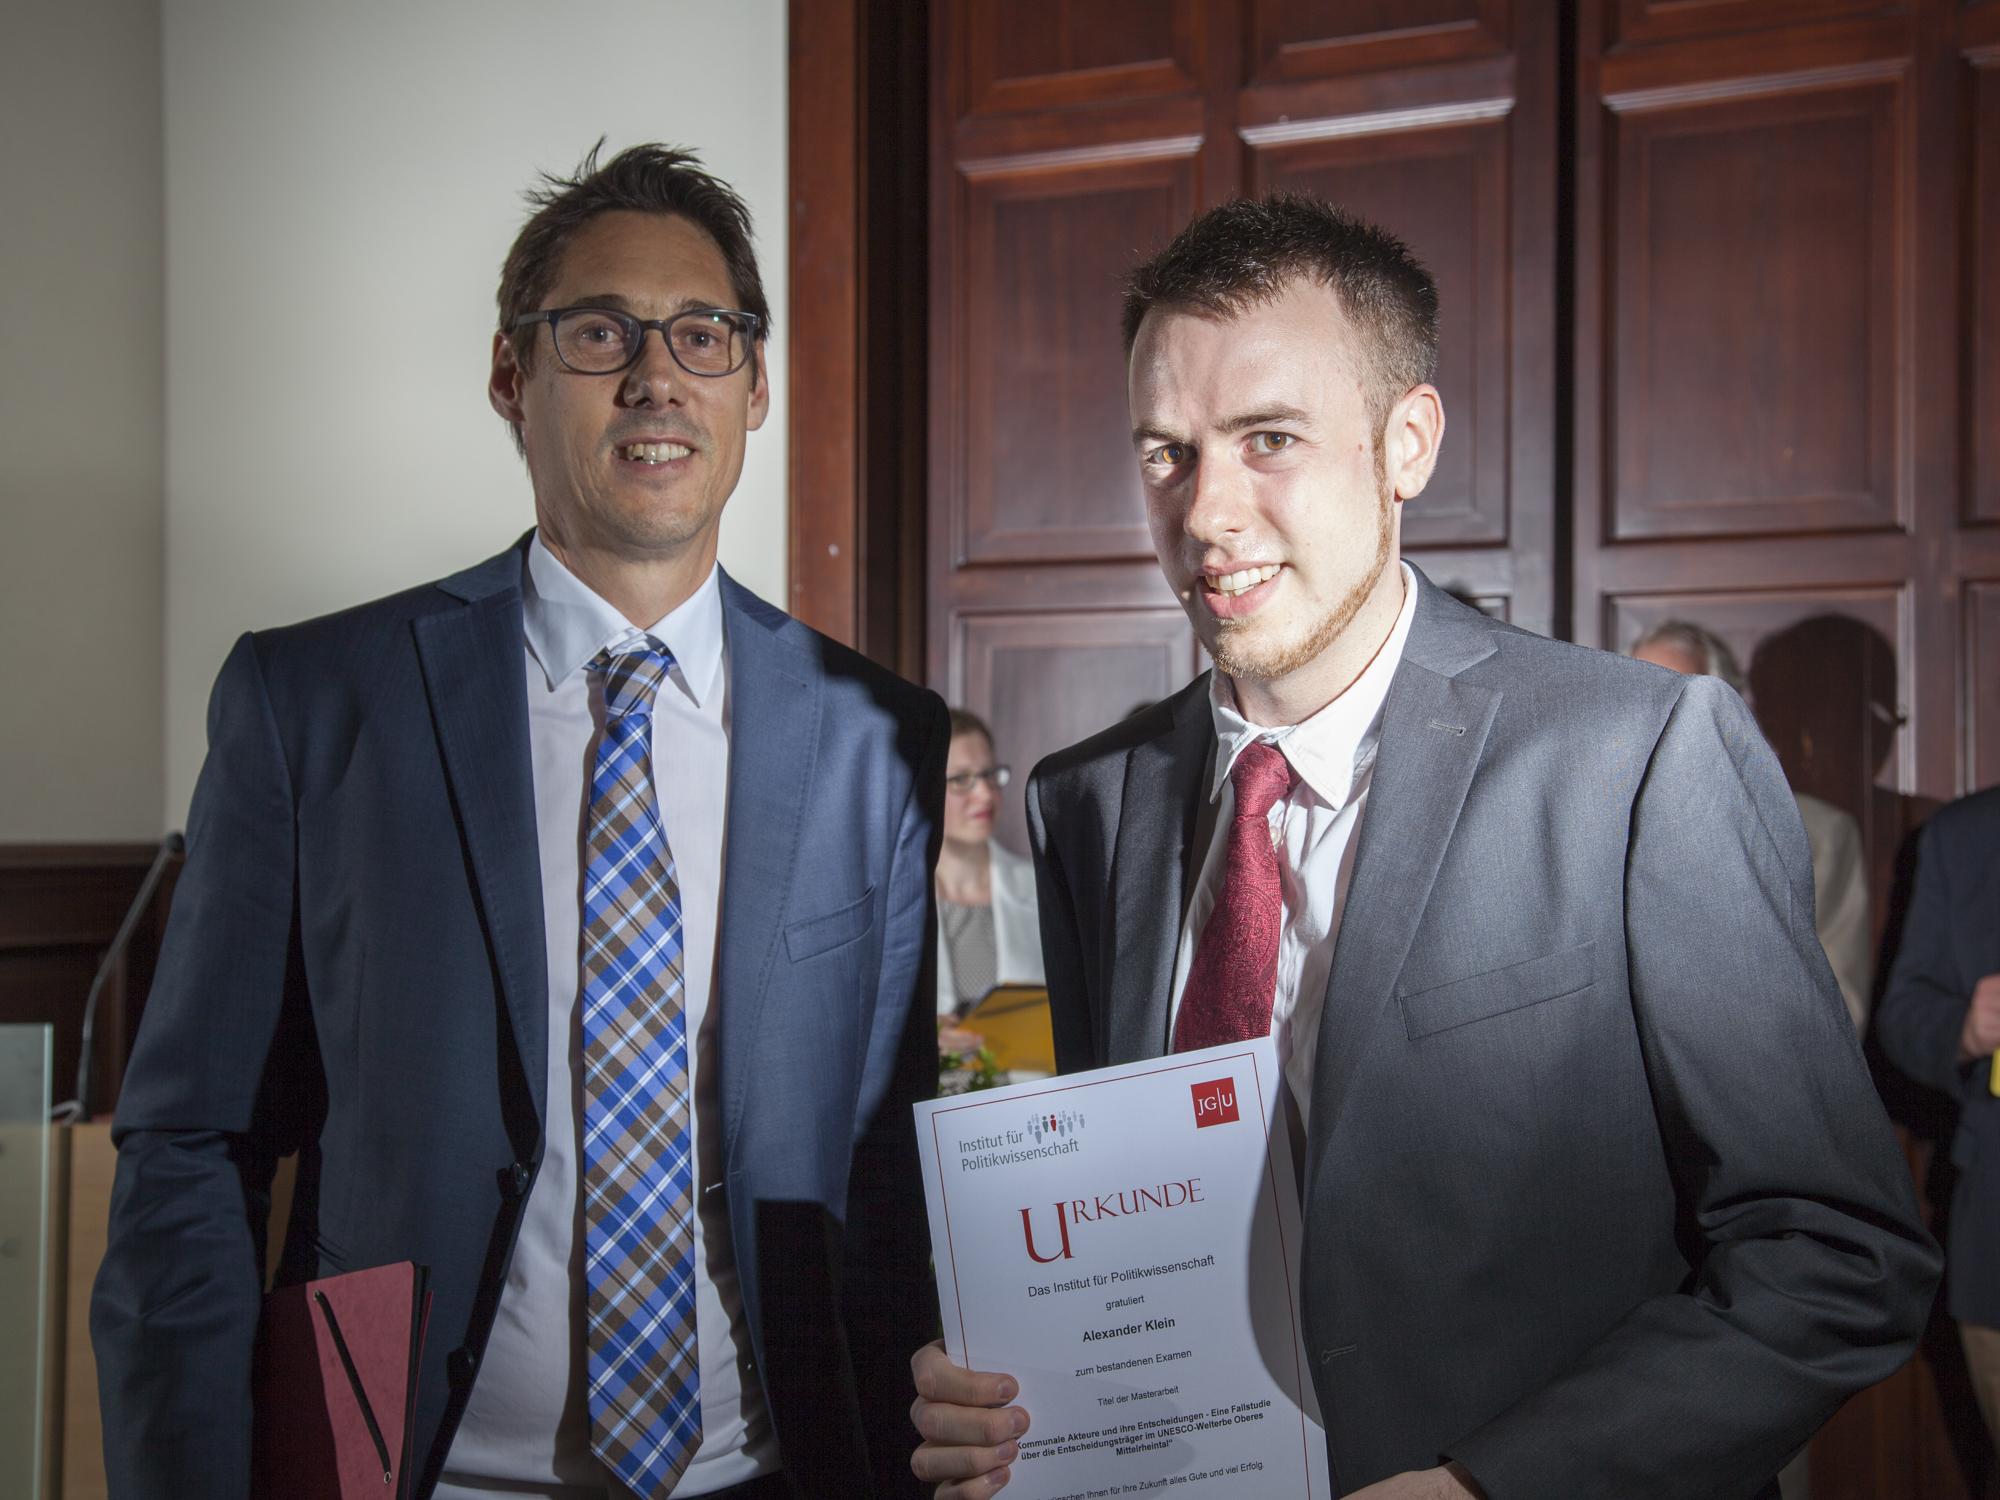 Abschlussfeier Politikwissenschaften (40)